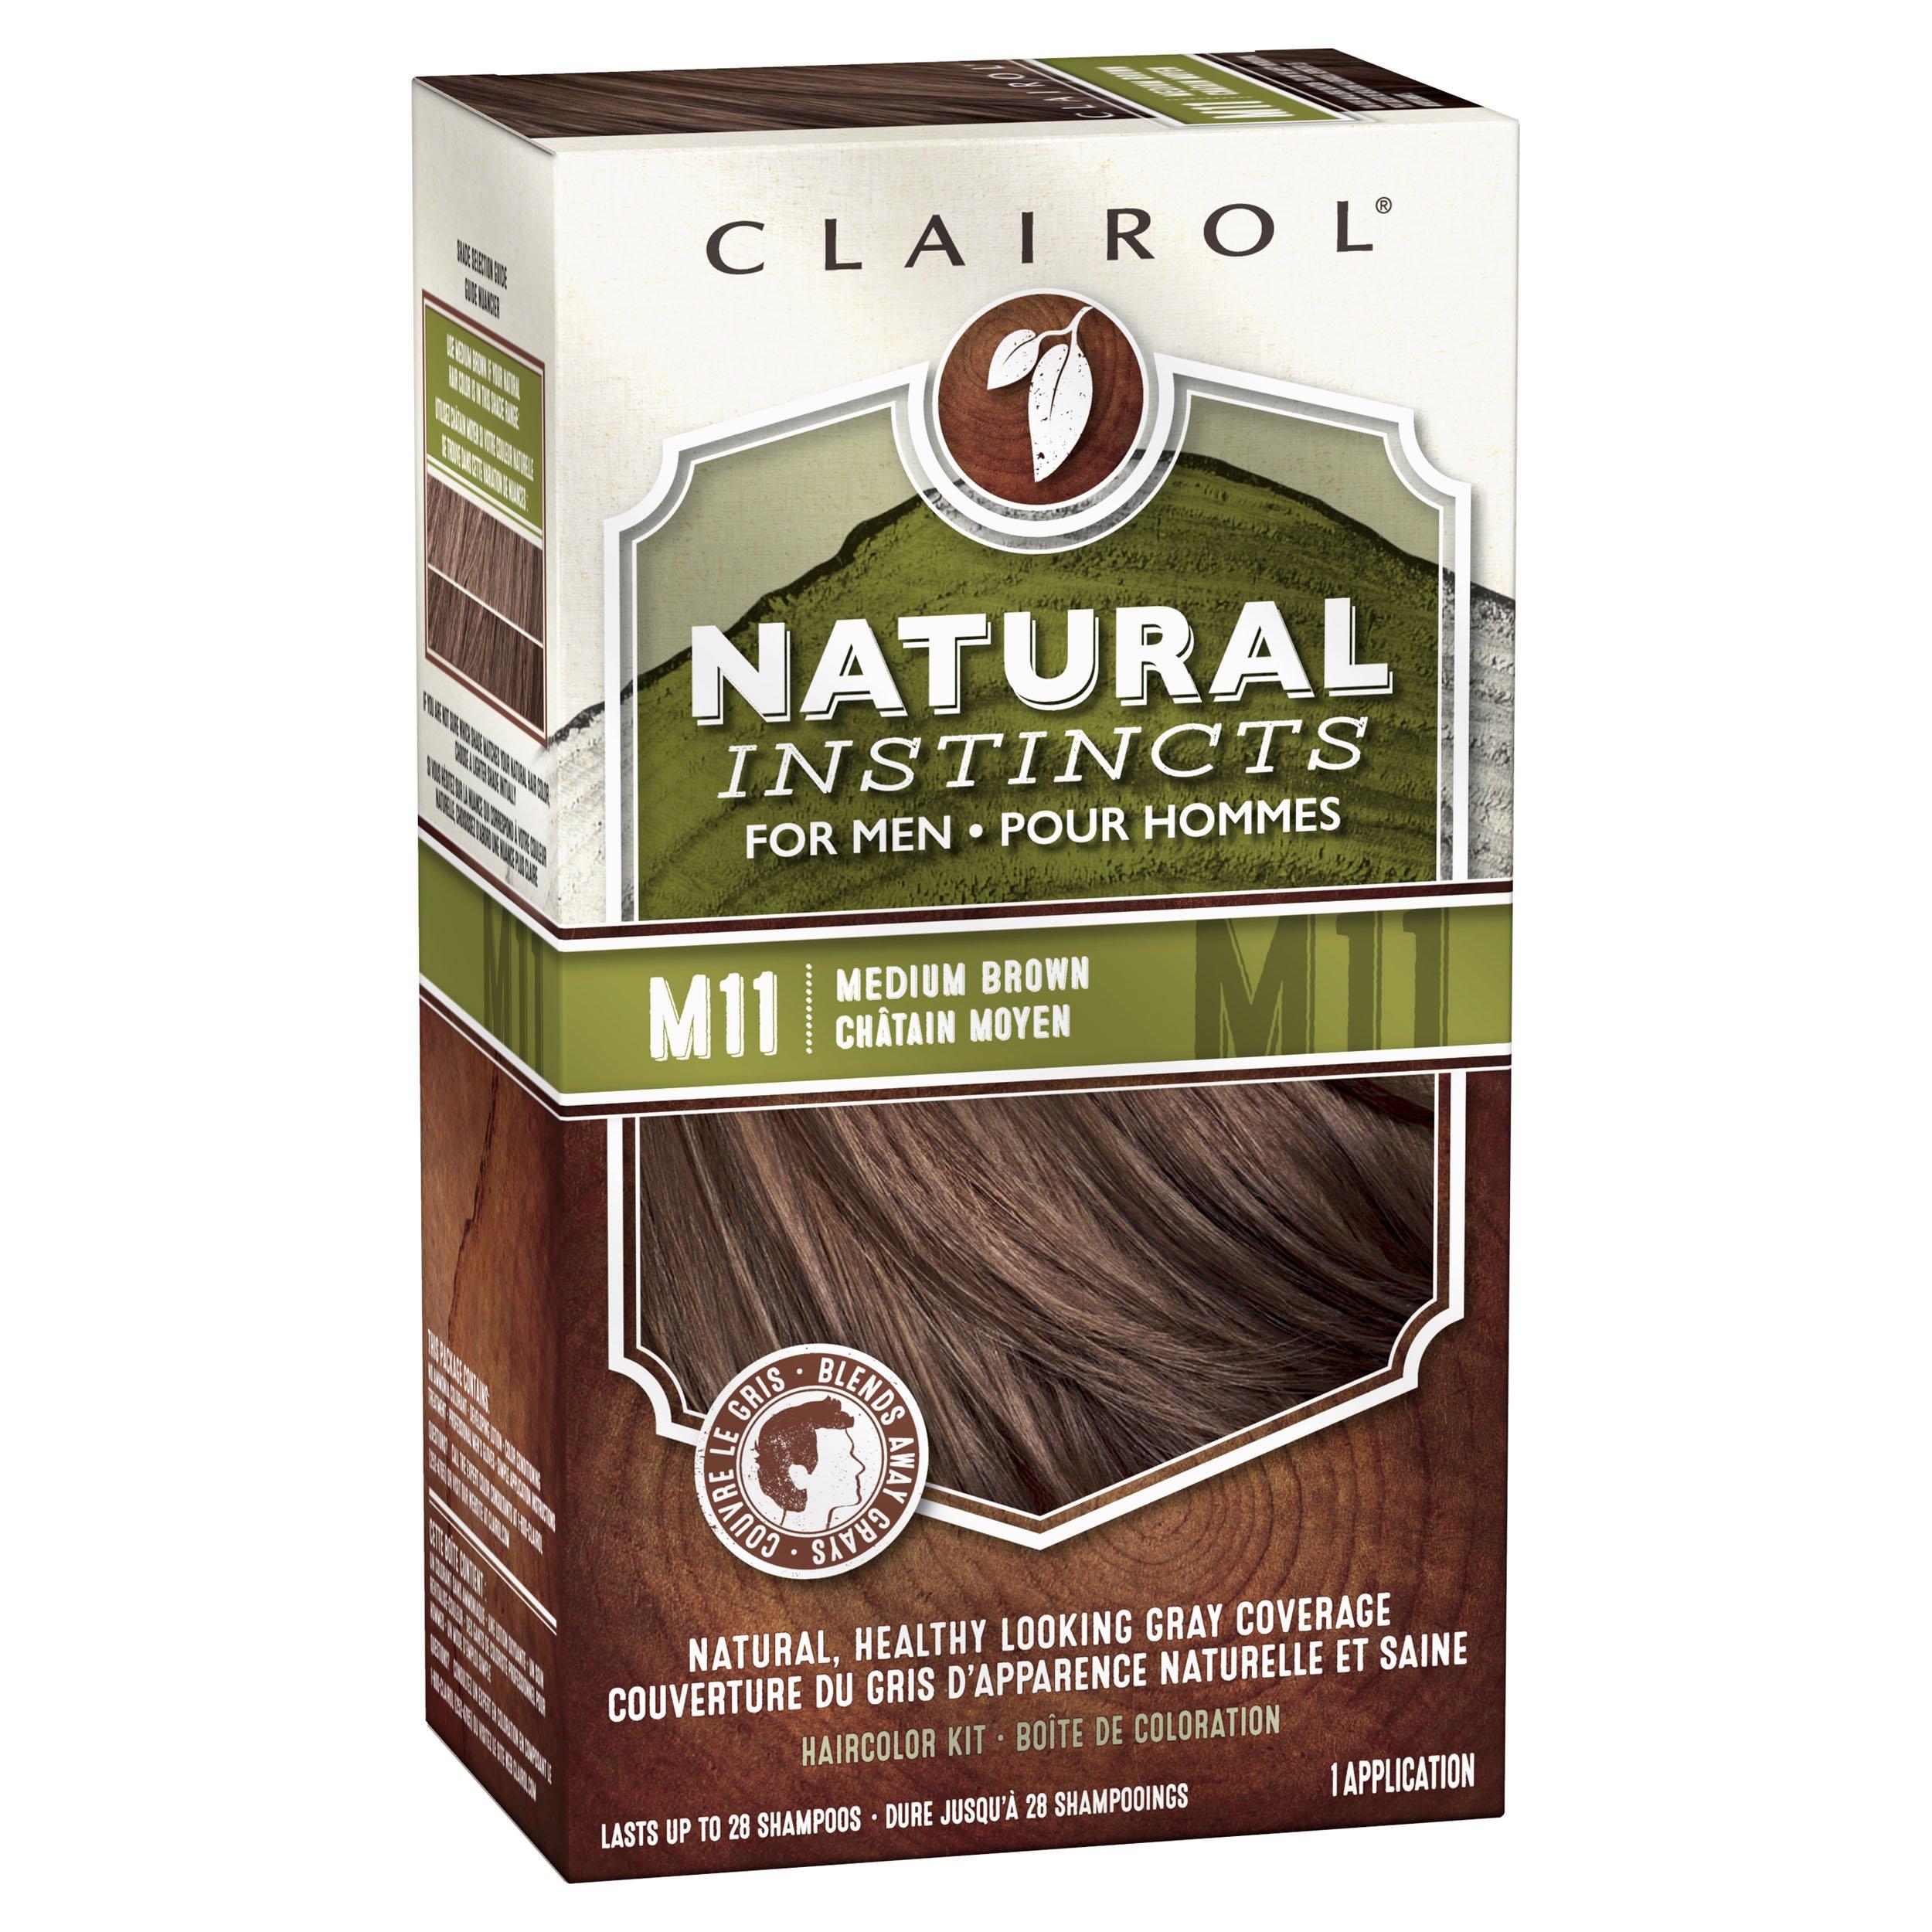 Clairol Natural Instincts Semi Permanent Hair Color Kit For Men 3